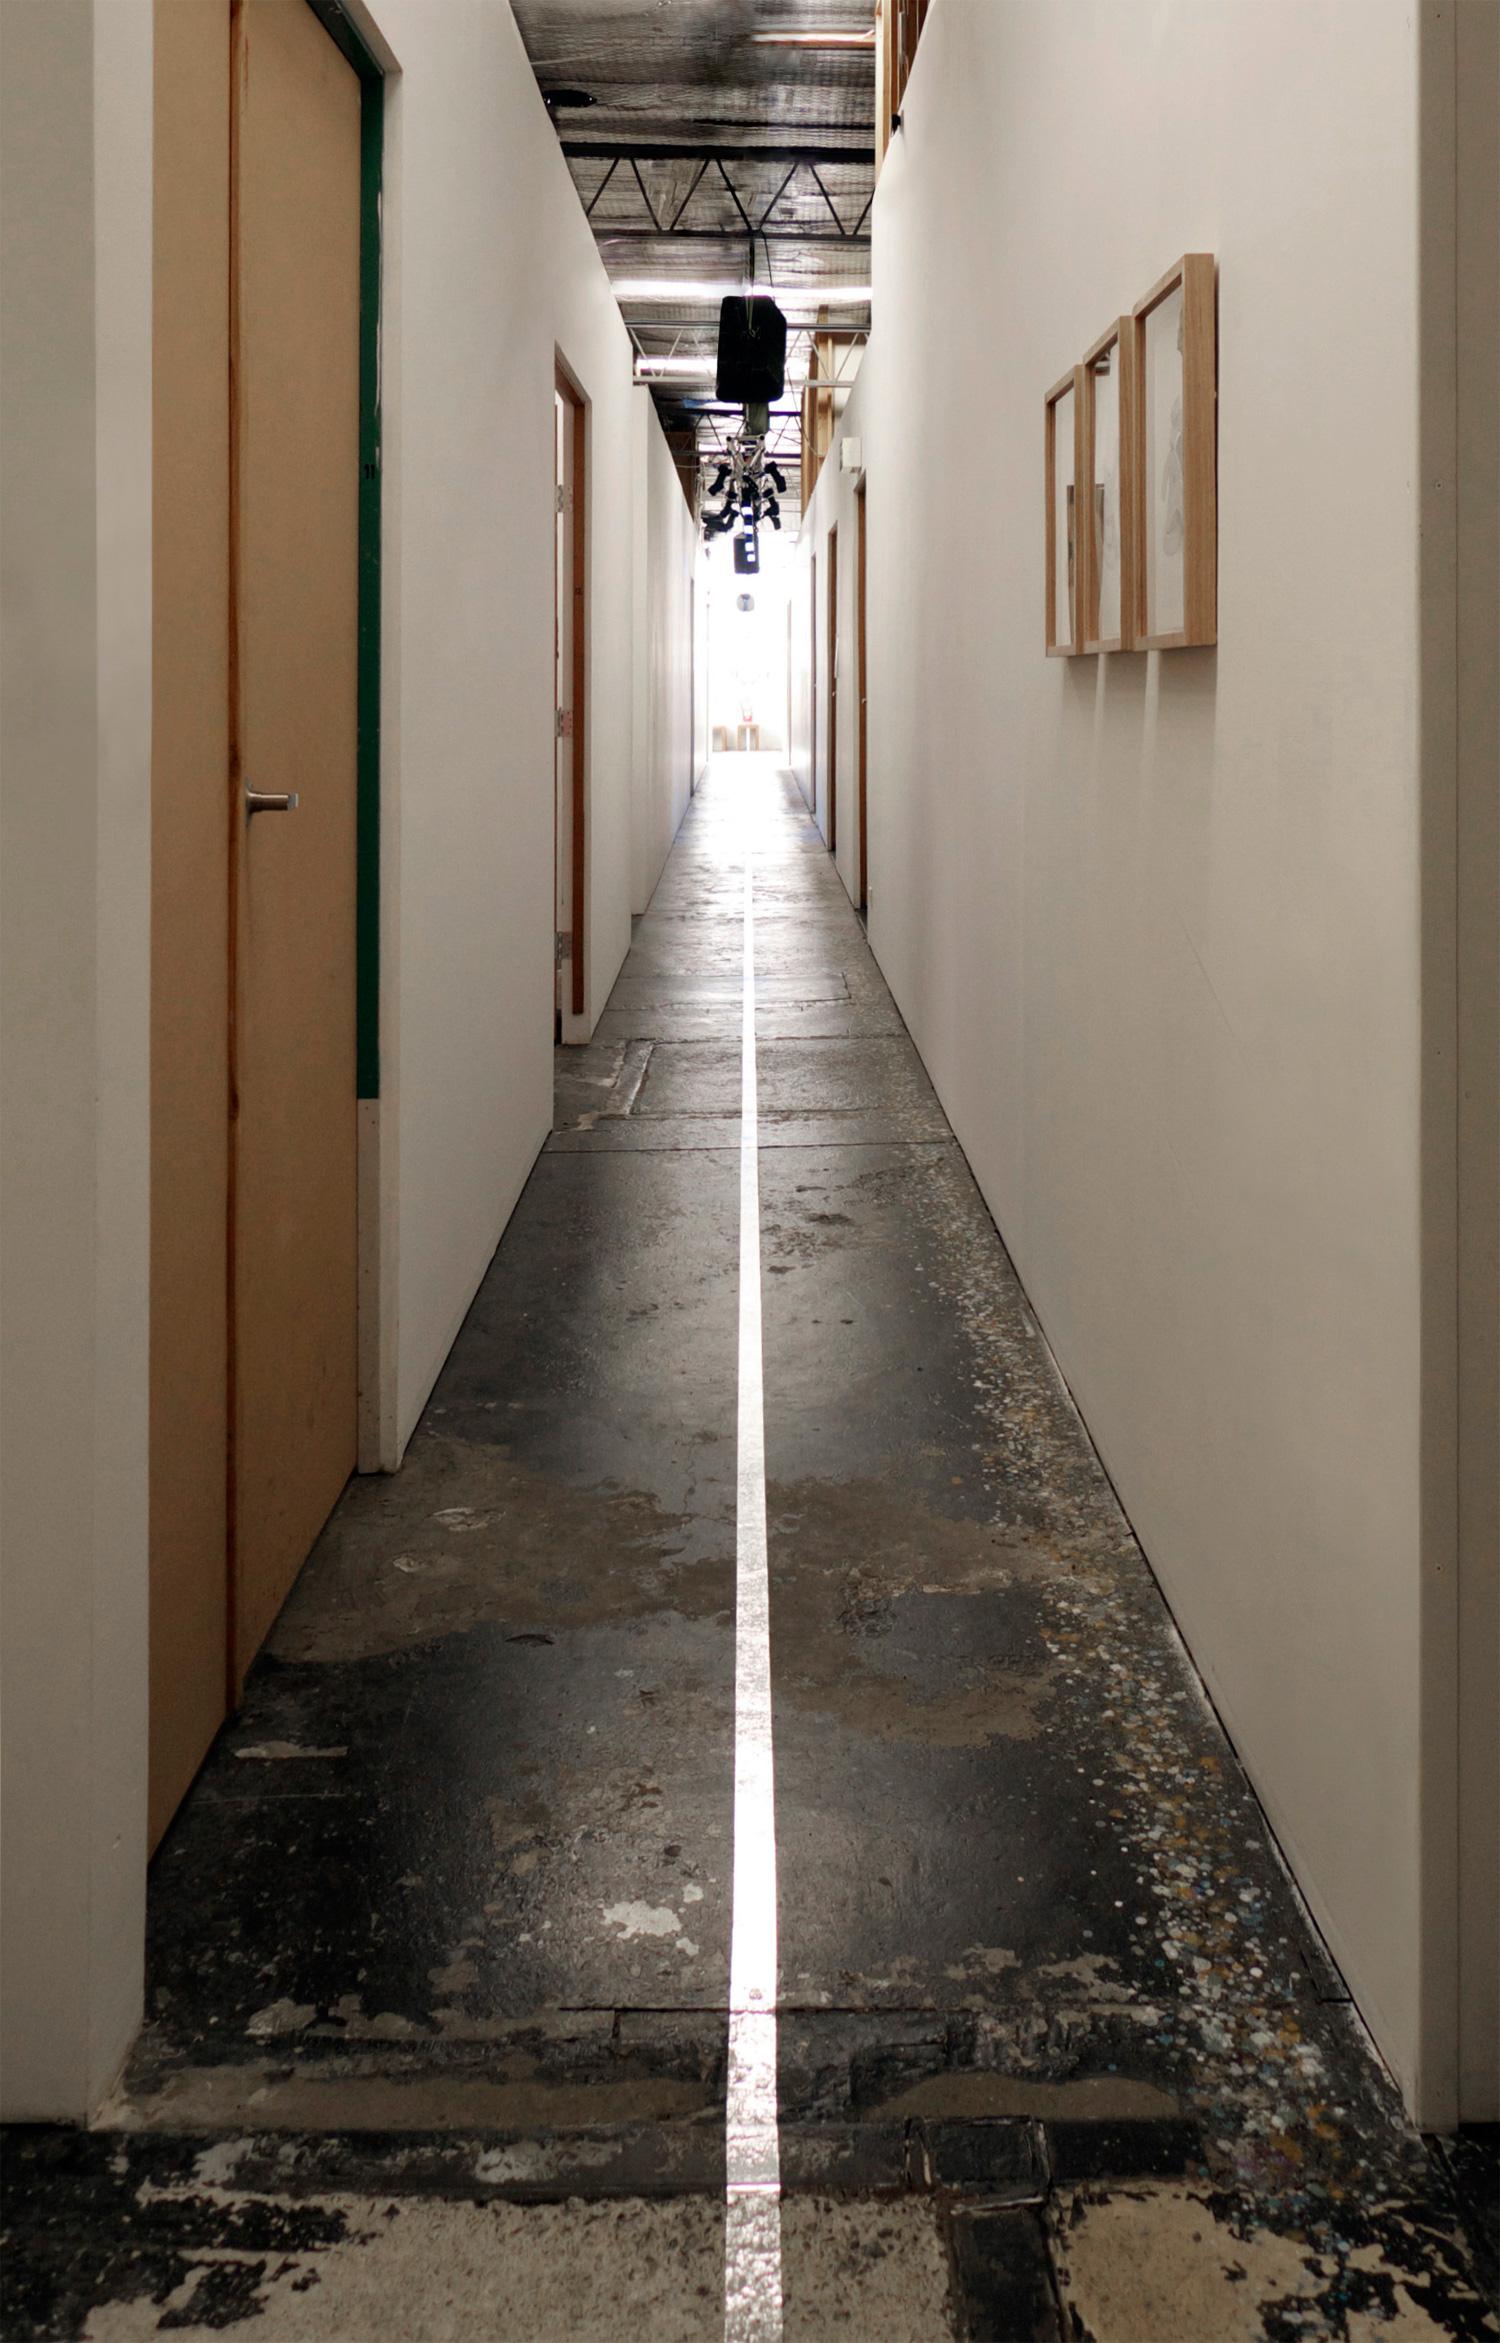 Passage-3b-Buckley-72pdi-1500px-web.jpg